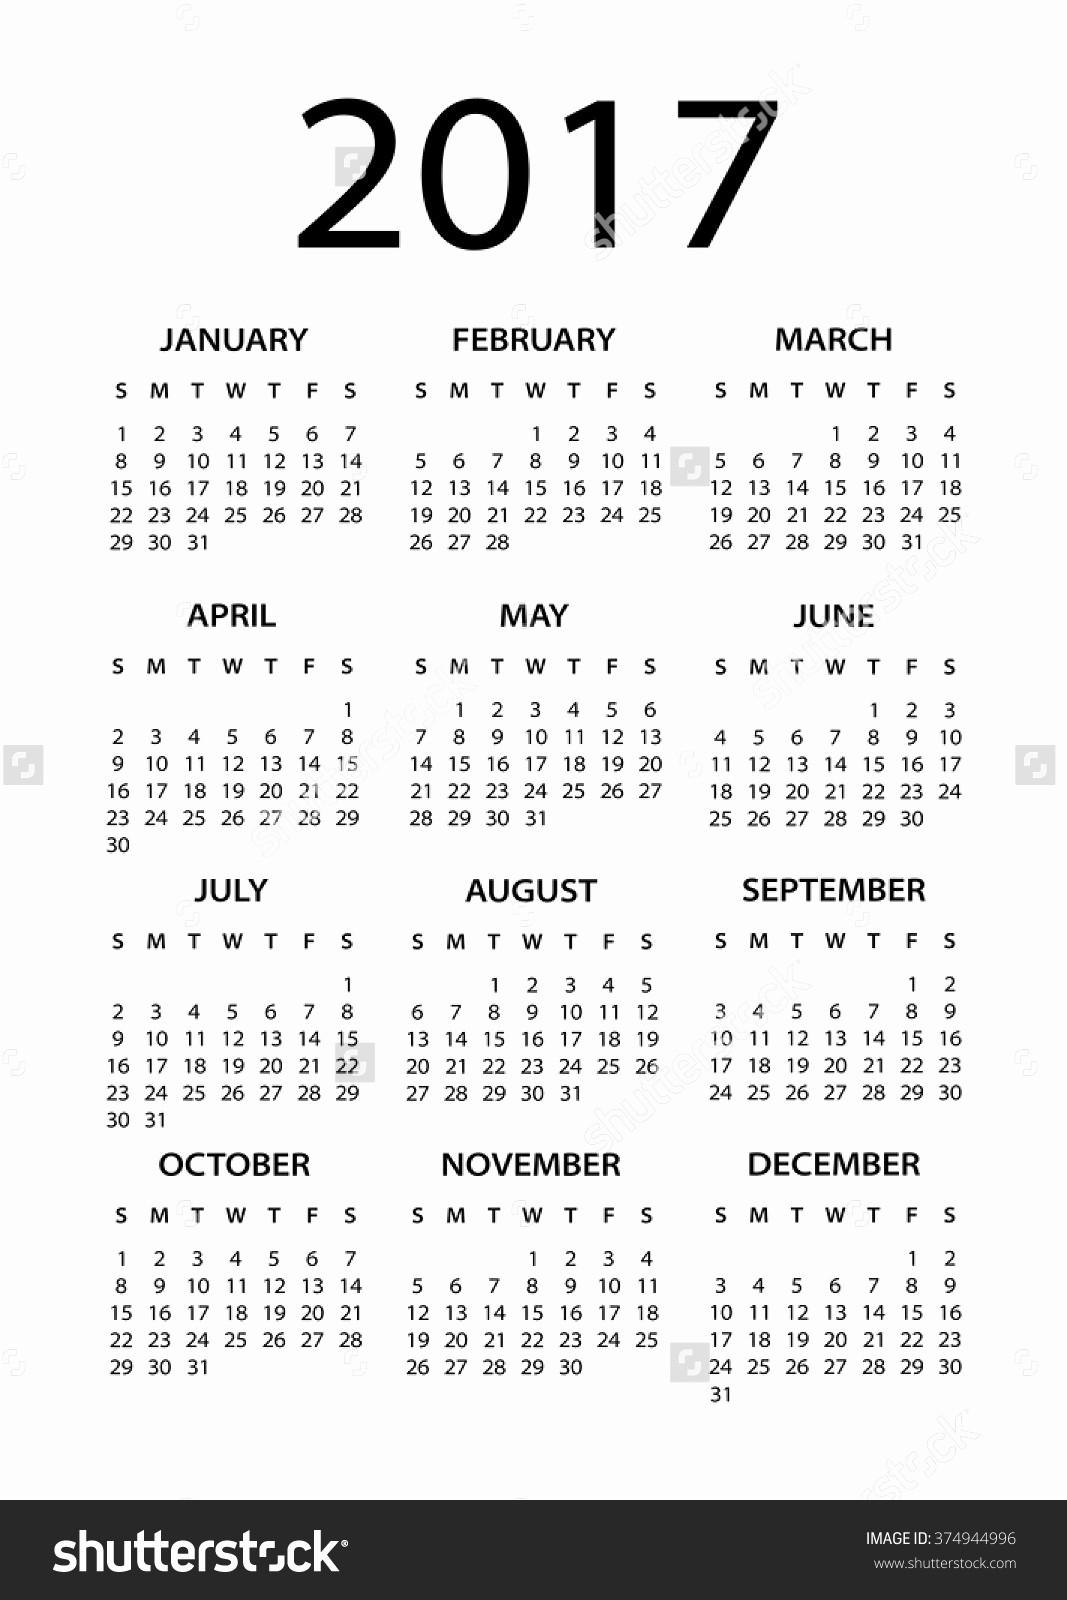 Black and White Calendar Template Beautiful December 2017 Calendar Black and White